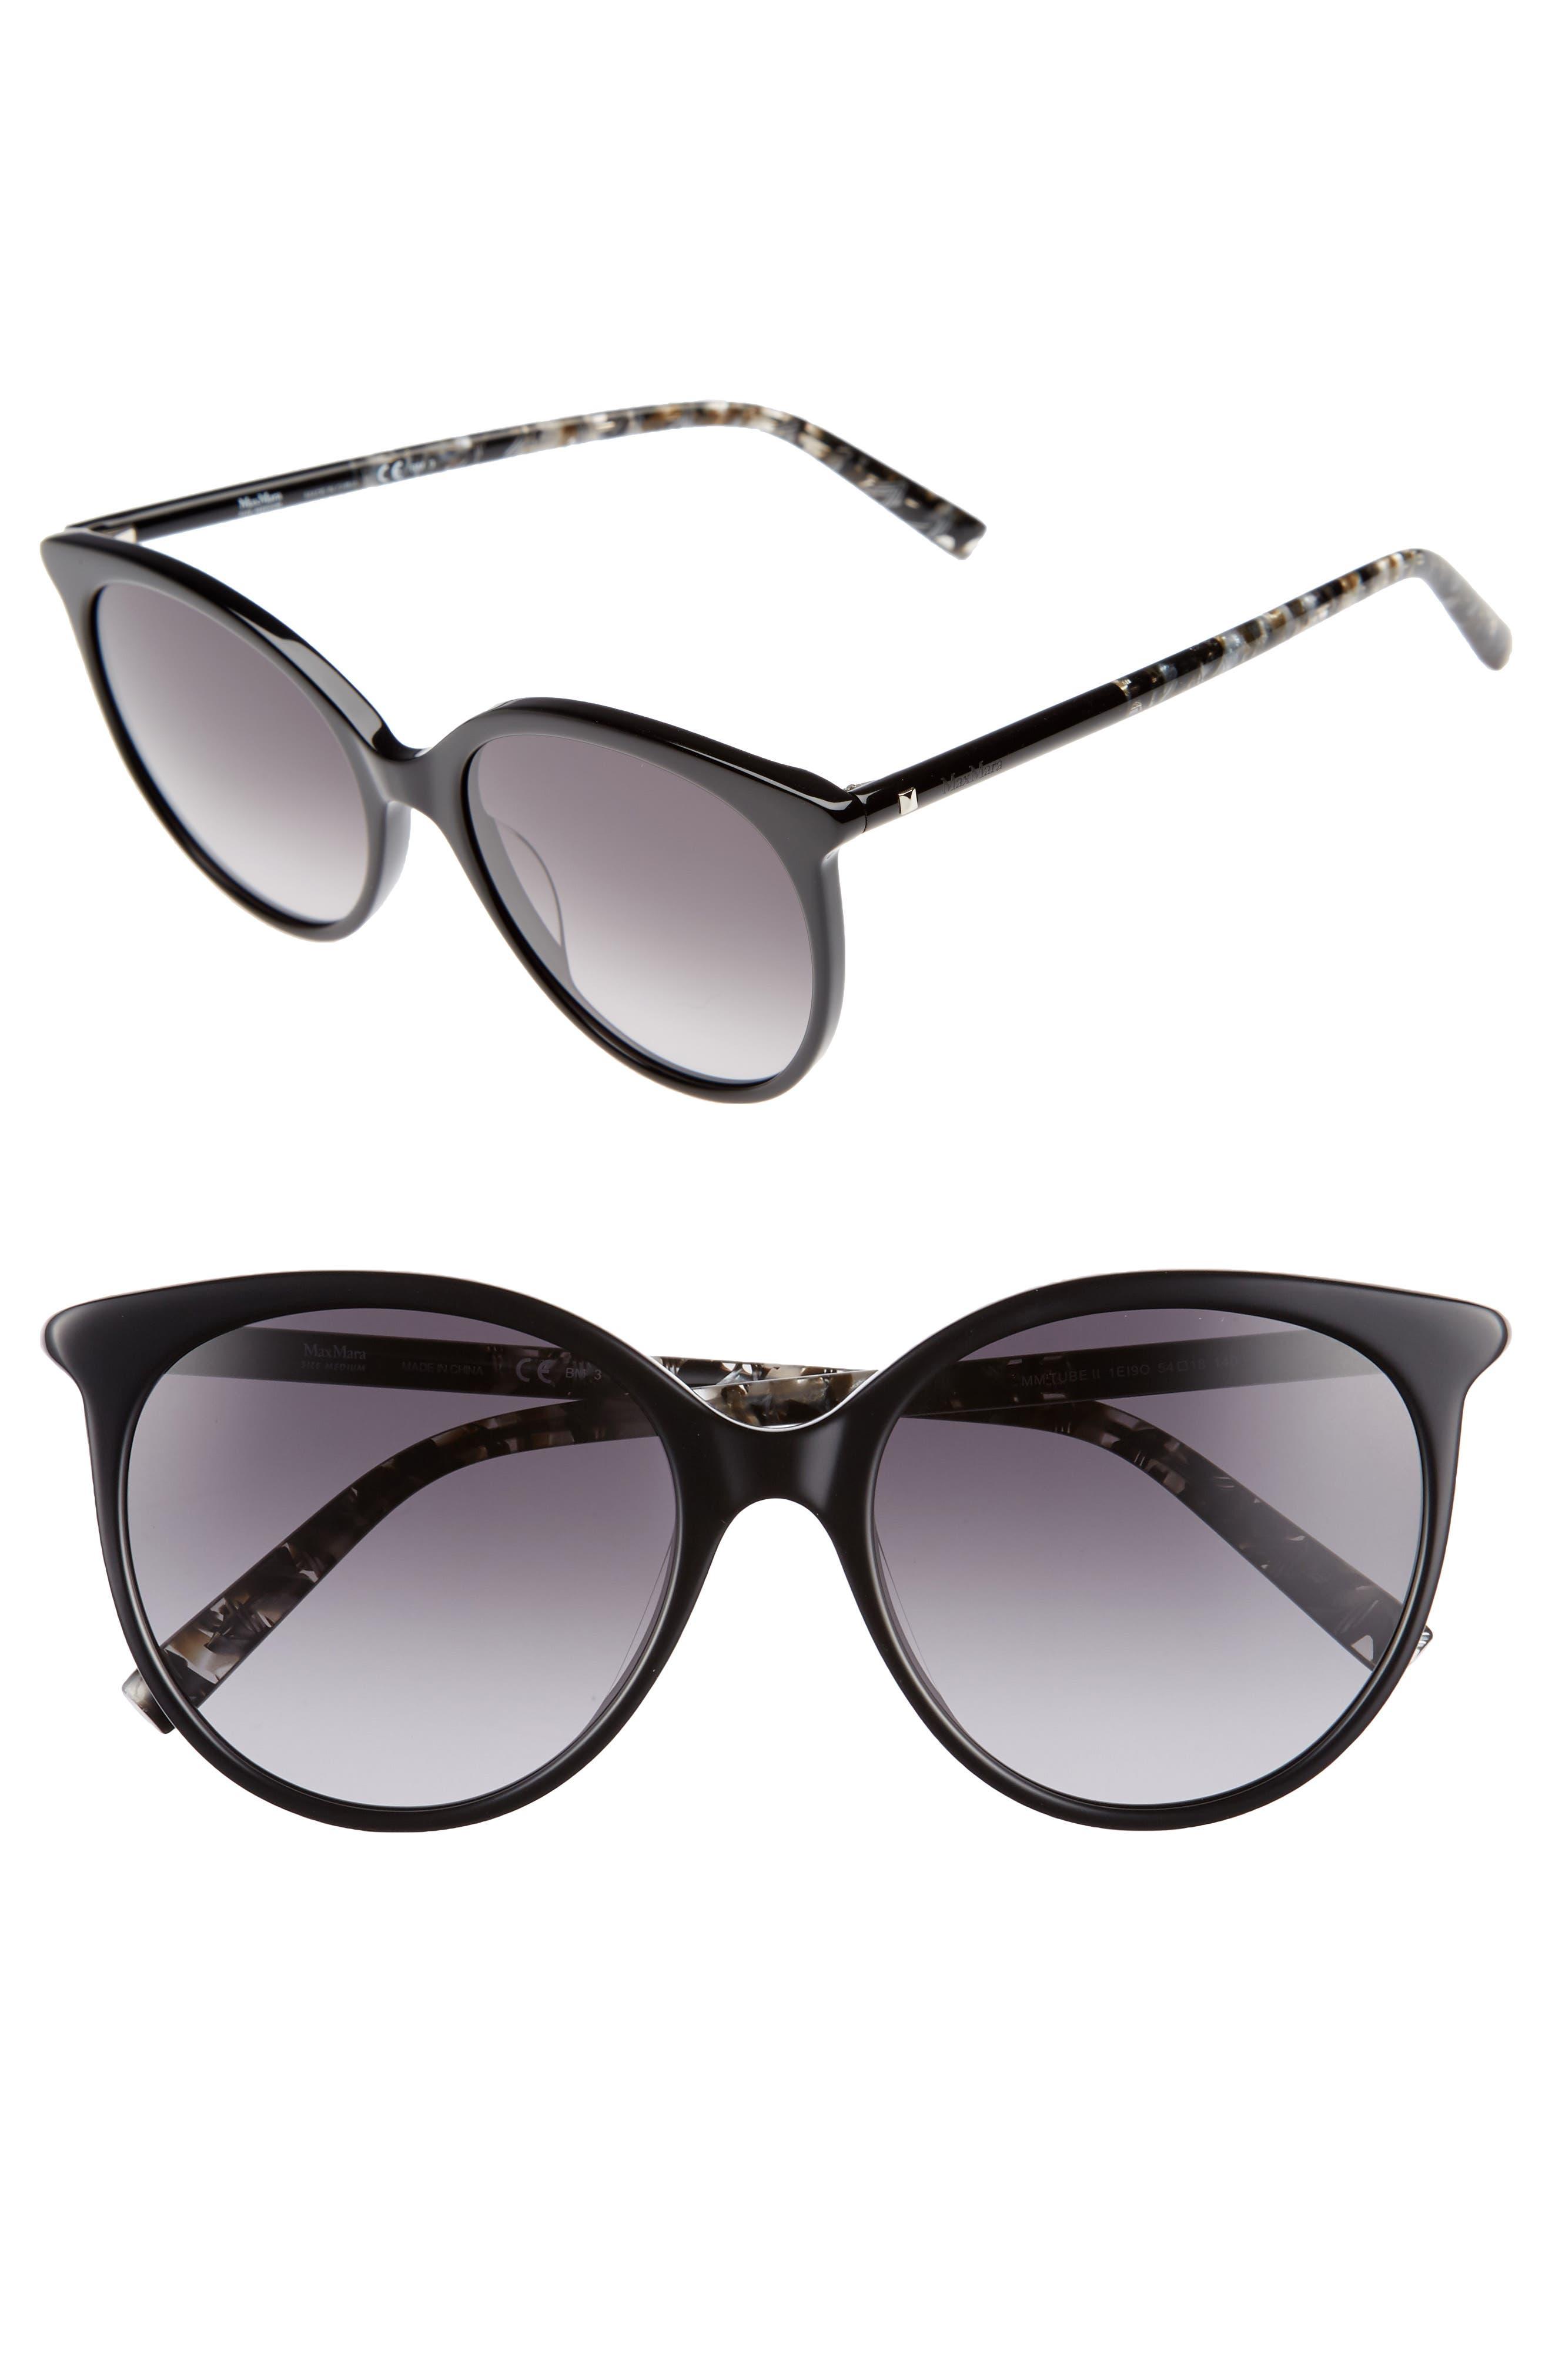 Tube 54mm Gradient Lens Cat Eye Sunglasses,                         Main,                         color, BLACK/ GREY